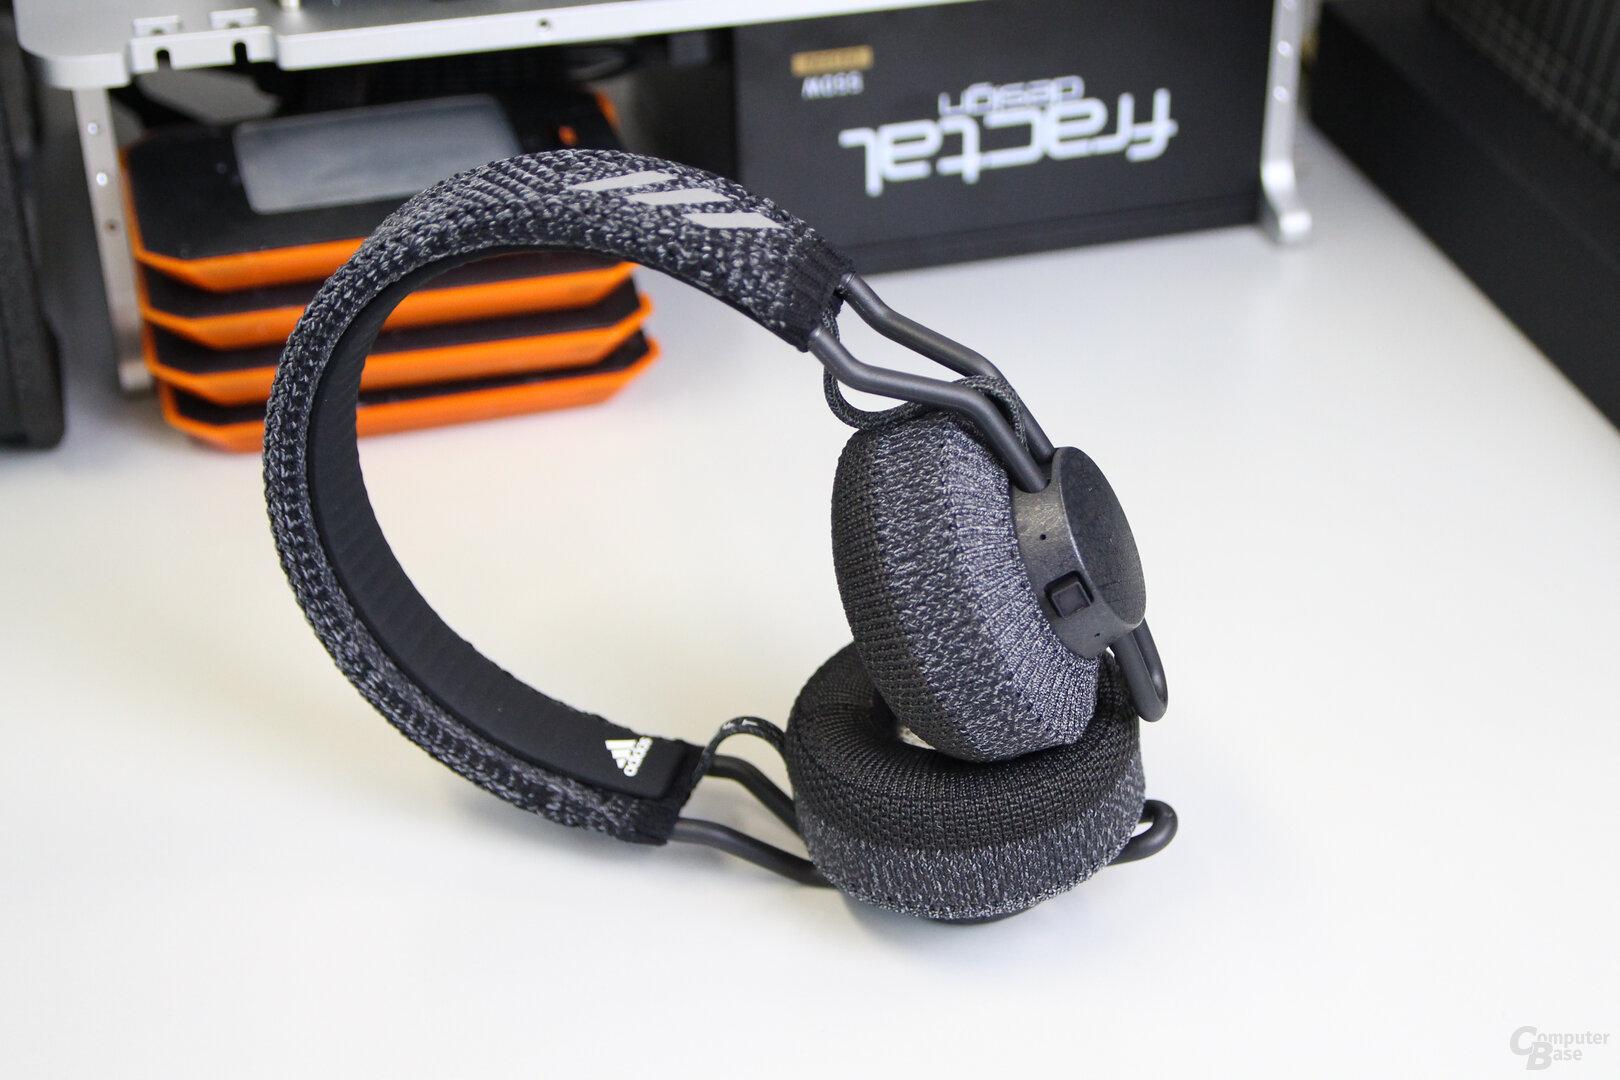 Adidas RPT-01 On-Ear-Kopfhörer